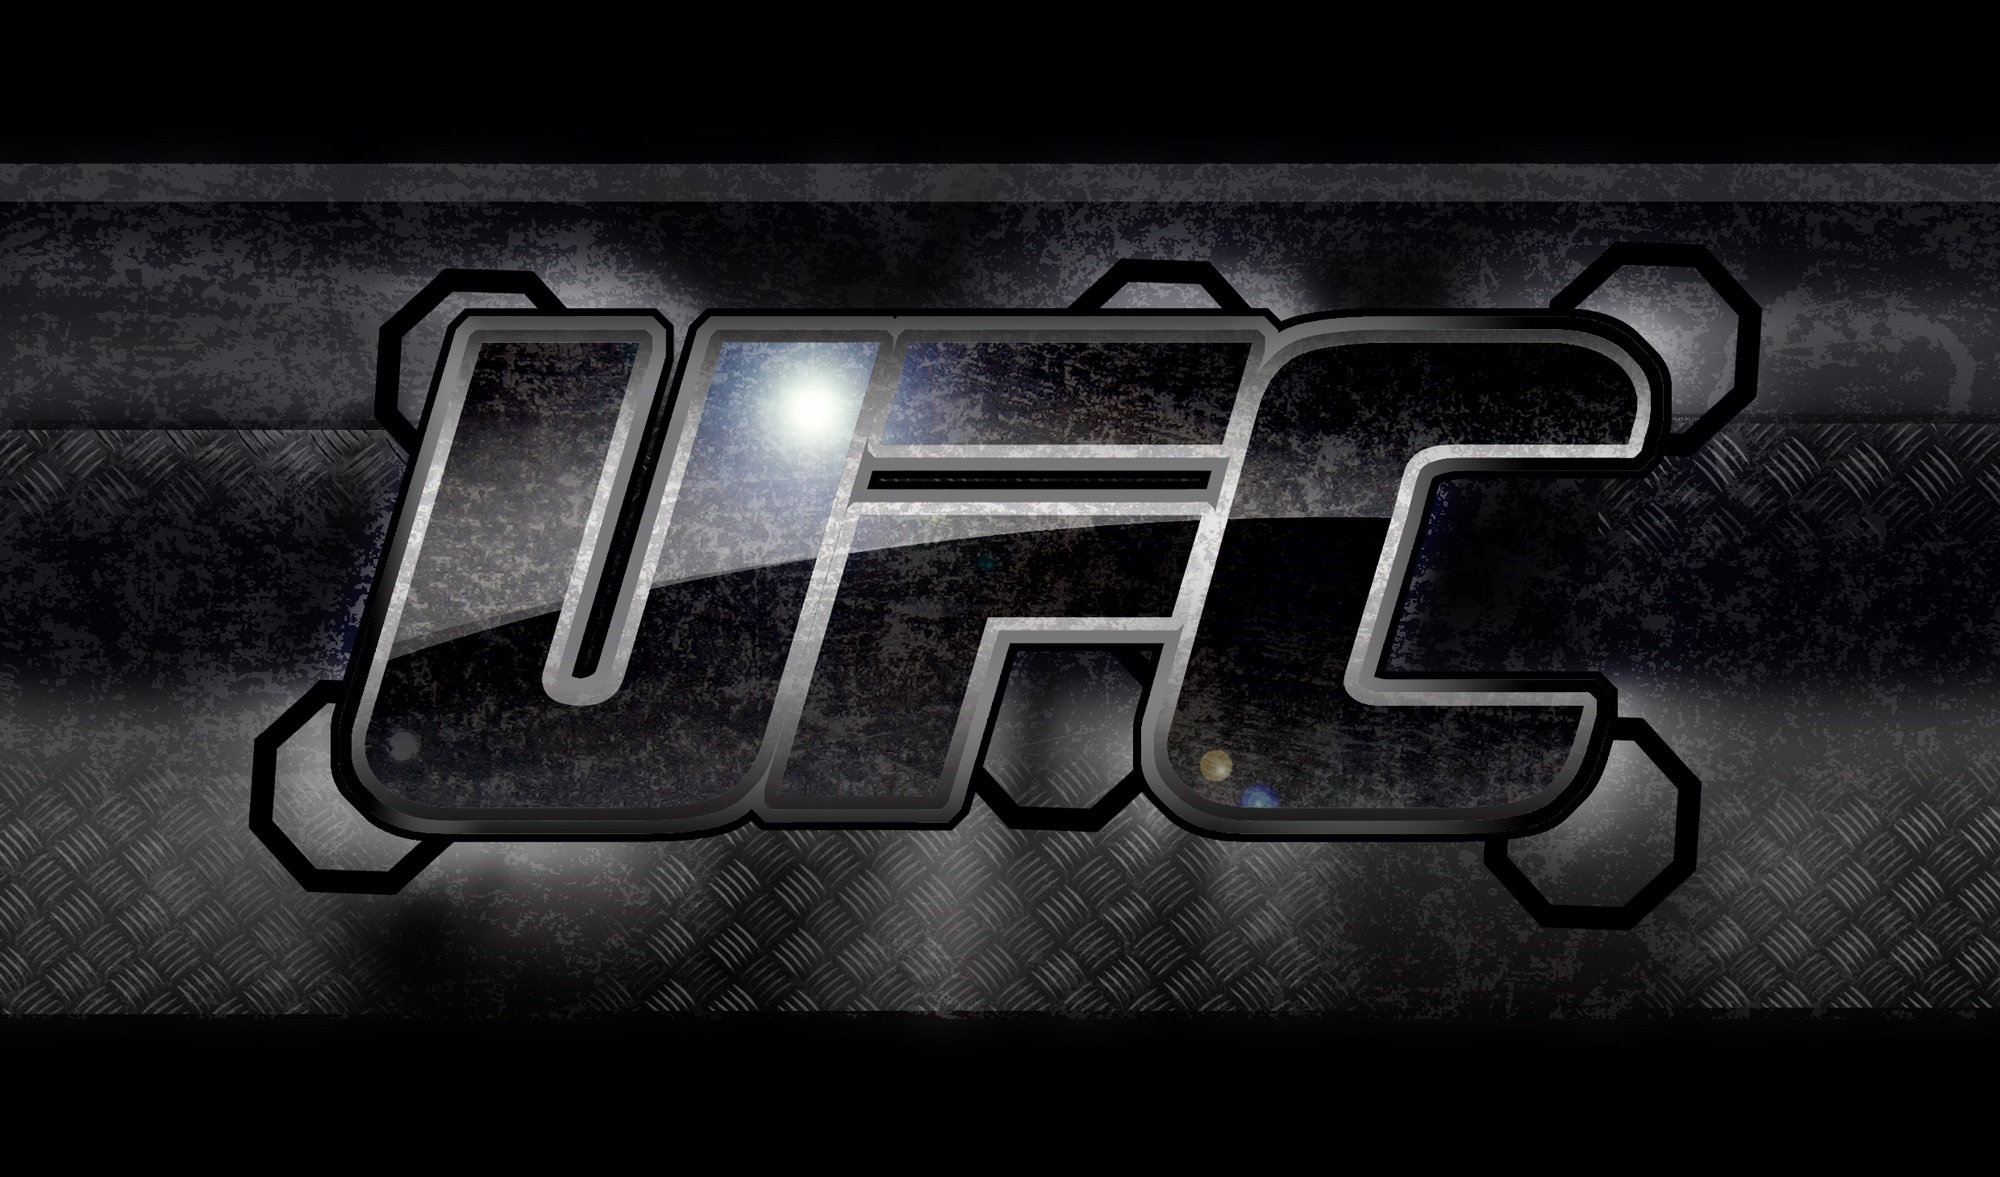 Ufc mma battle martial arts action logo y wallpaper 2000x1177 171322 wallpaperup - Free ufc wallpapers ...